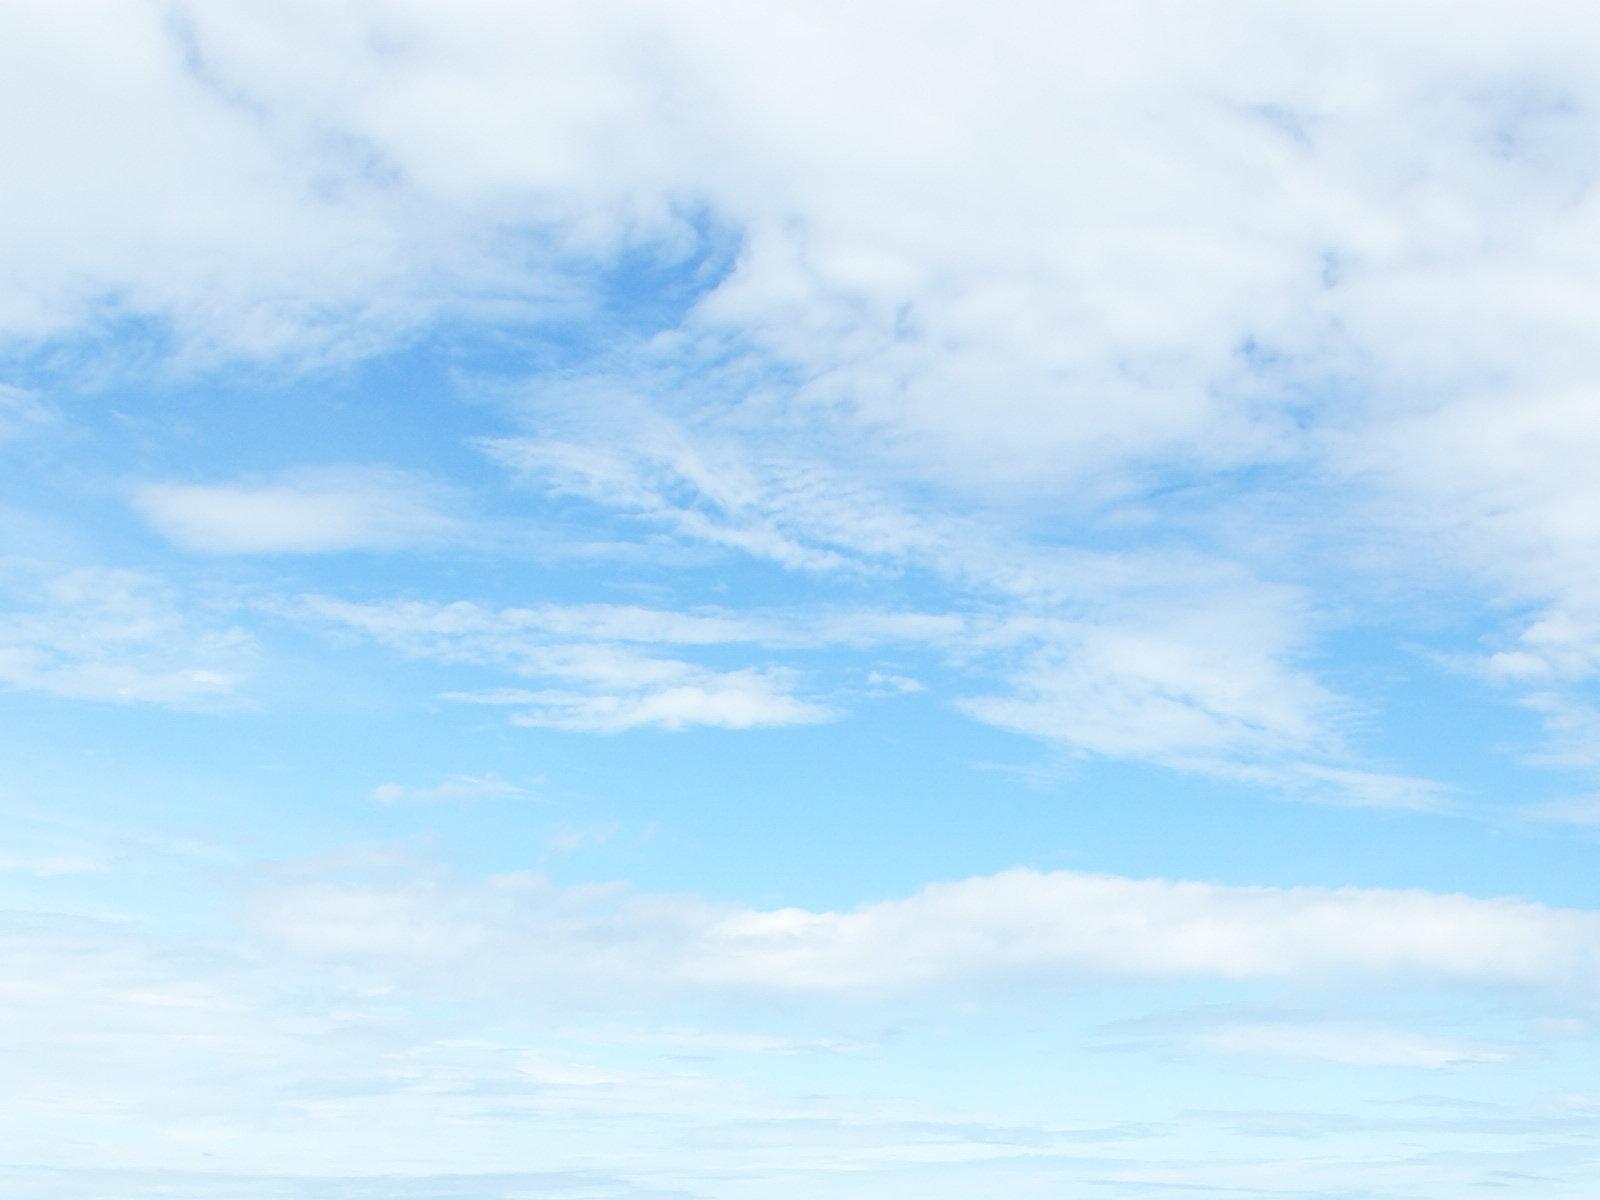 blue sky wallpaper hd wallpapers pulse